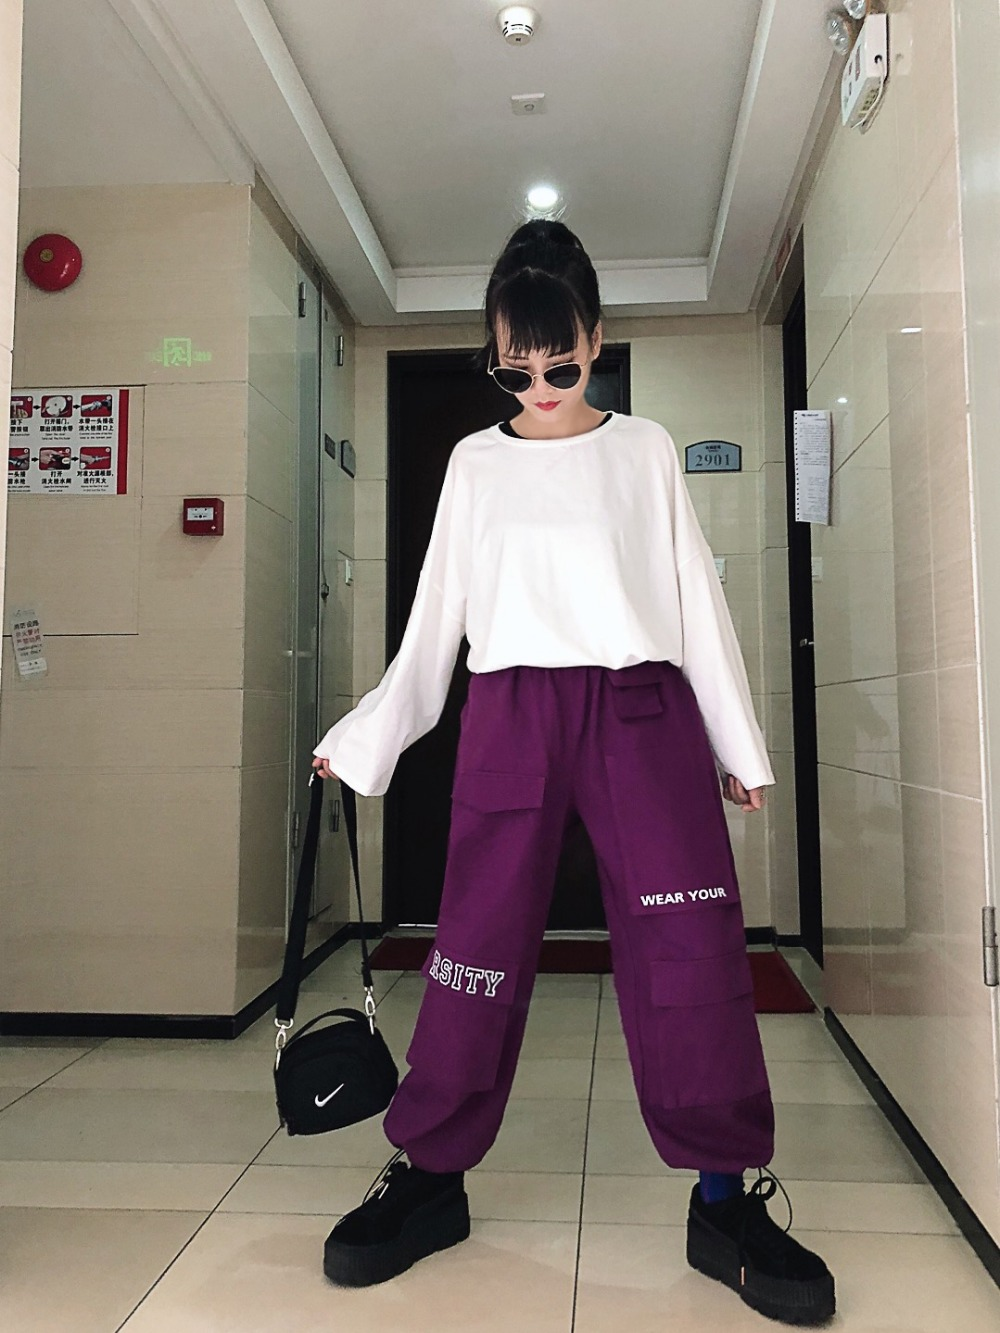 Ancha Bordado 2019 Pierna púrpura Pantalones Carta Otoño Marca Negro Costura Mujer Multi Moda De Bolsillos Herramientas Nueva qfw06Rxf